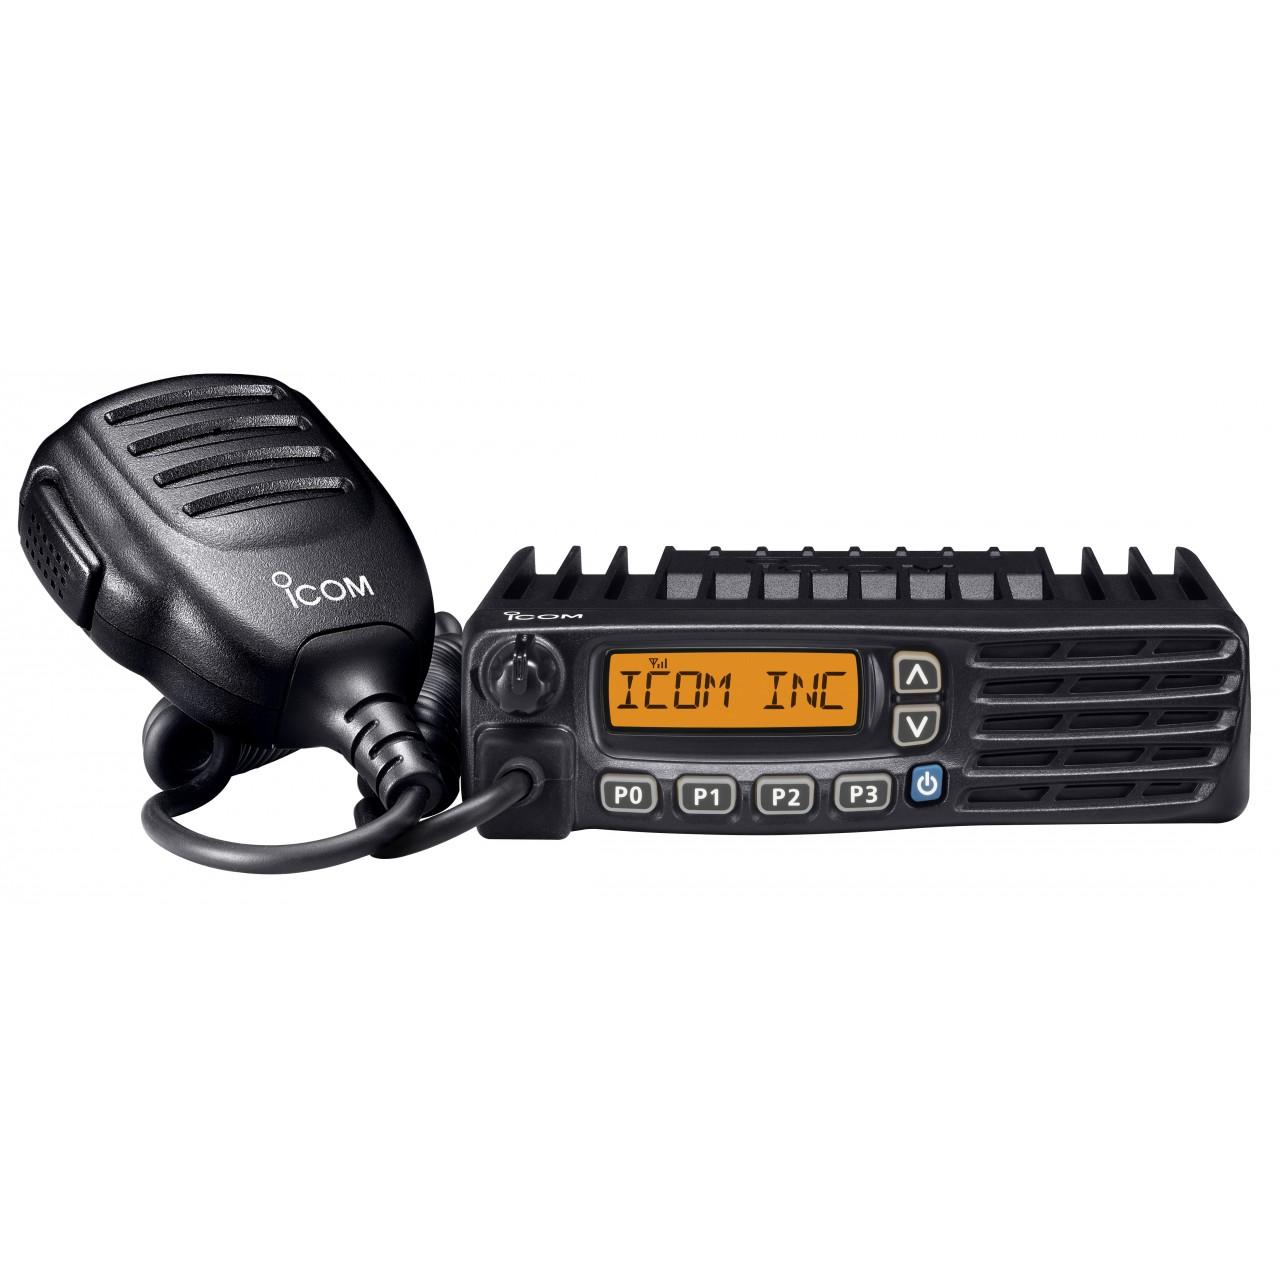 IC-F5023H Mobiles - ICOM